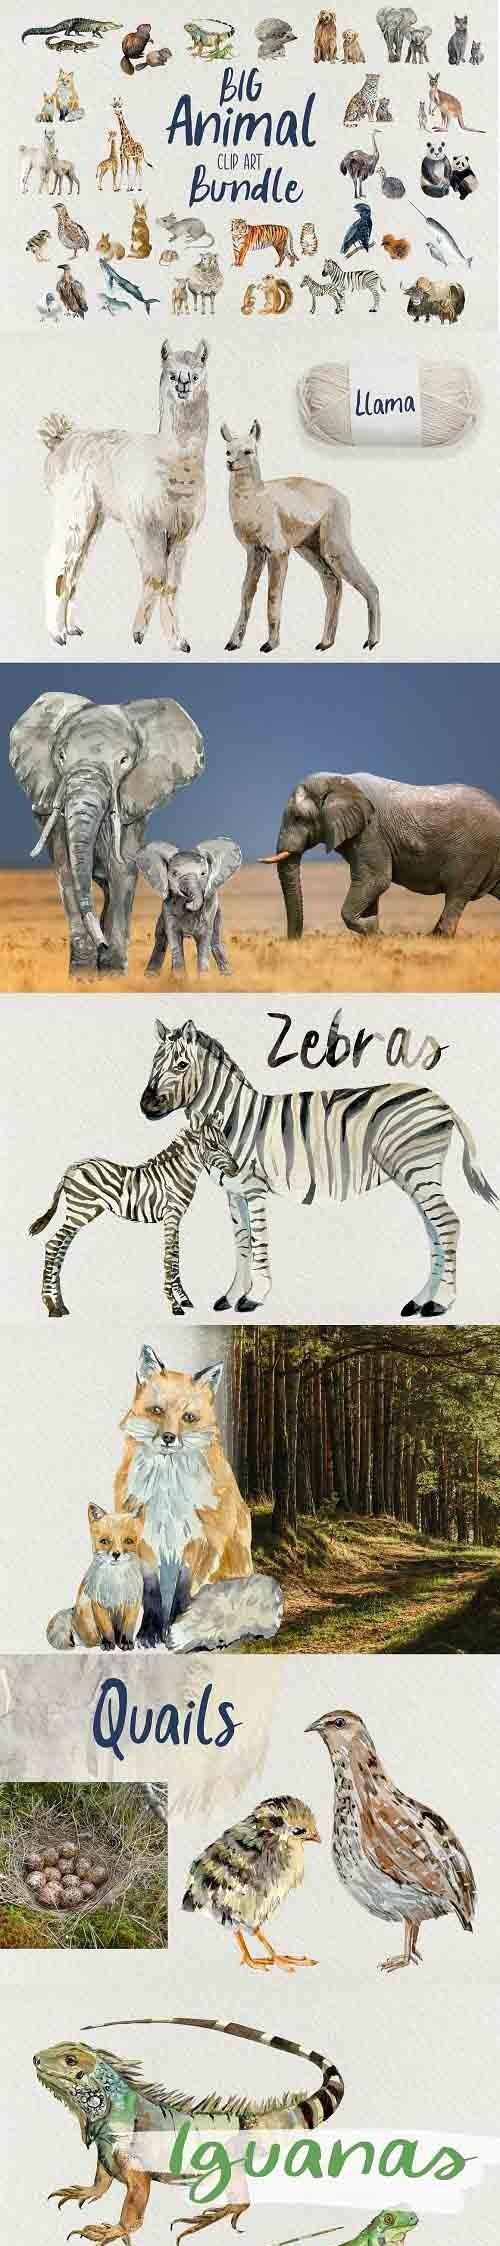 Big Animal Clip Art Bundle - 6016251